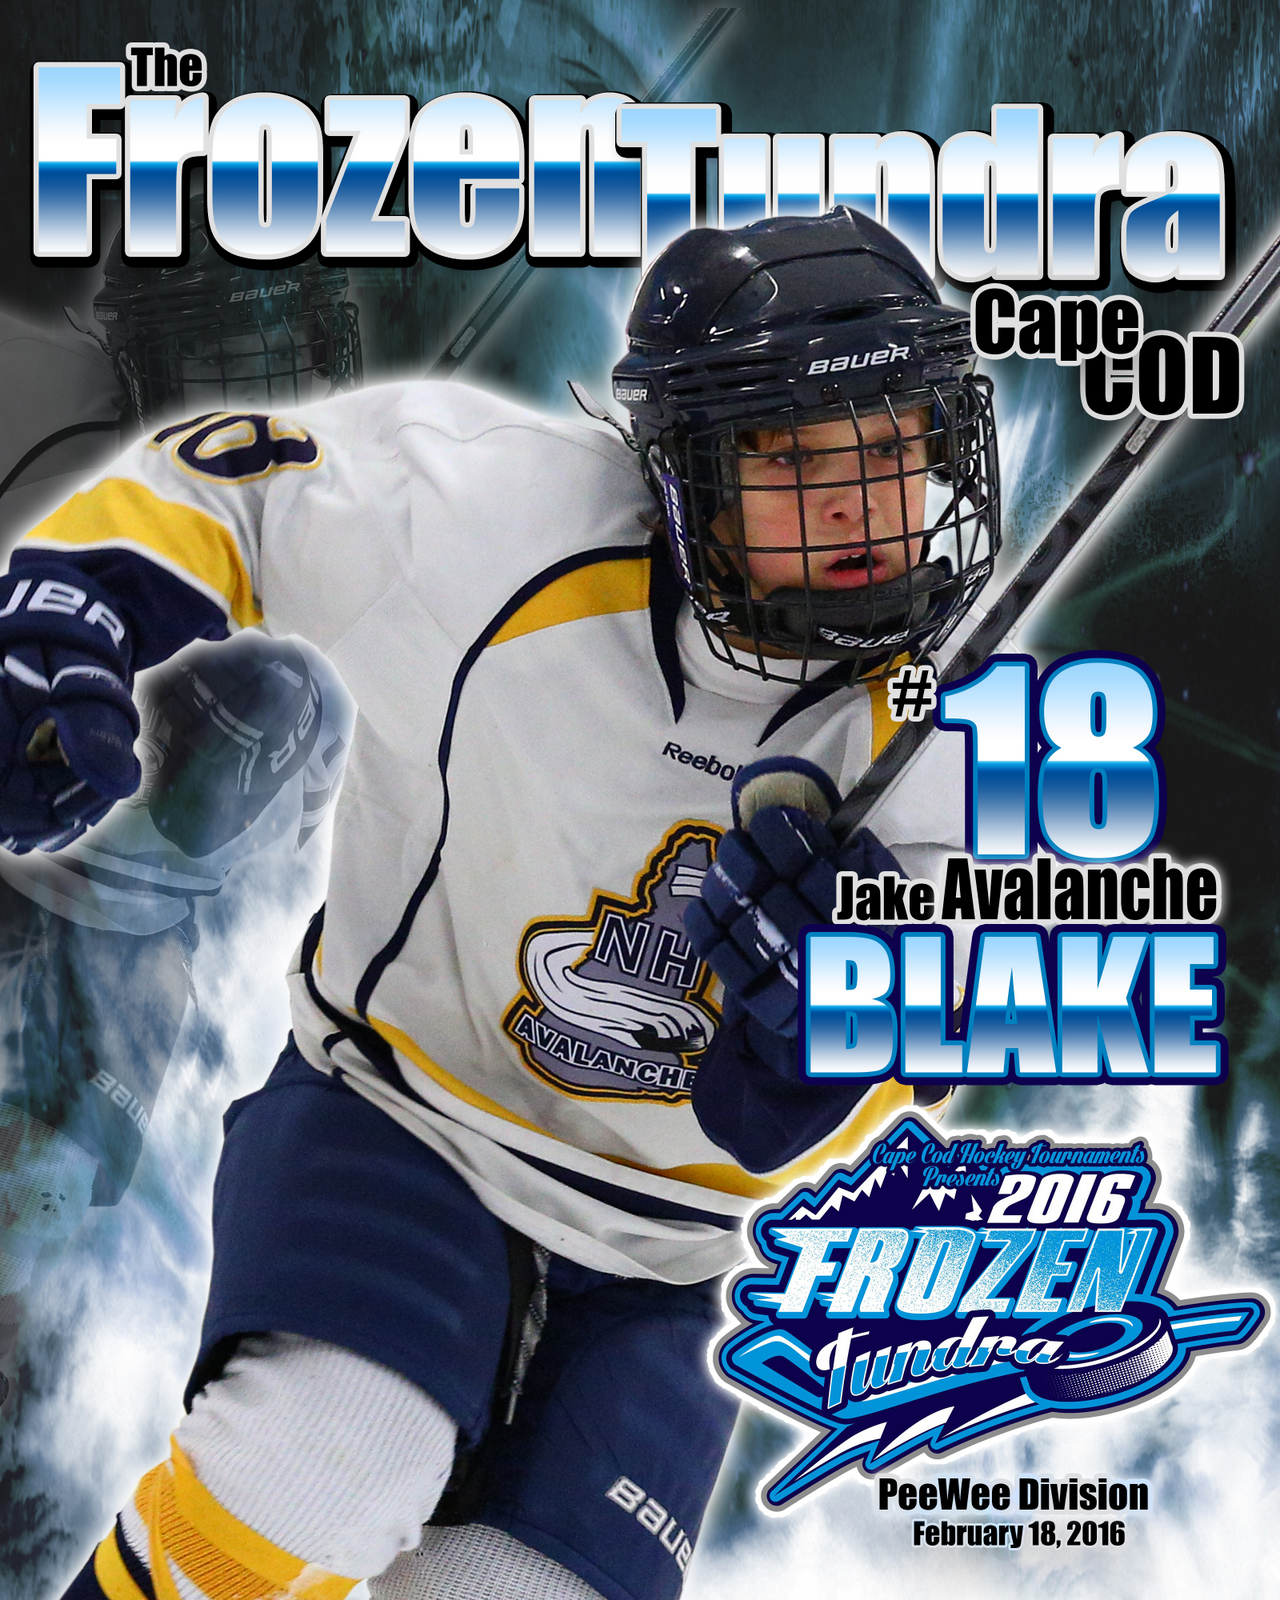 SilverPeak Studios Commemorative Poster Samples Action Sports Hockey Photography (1)